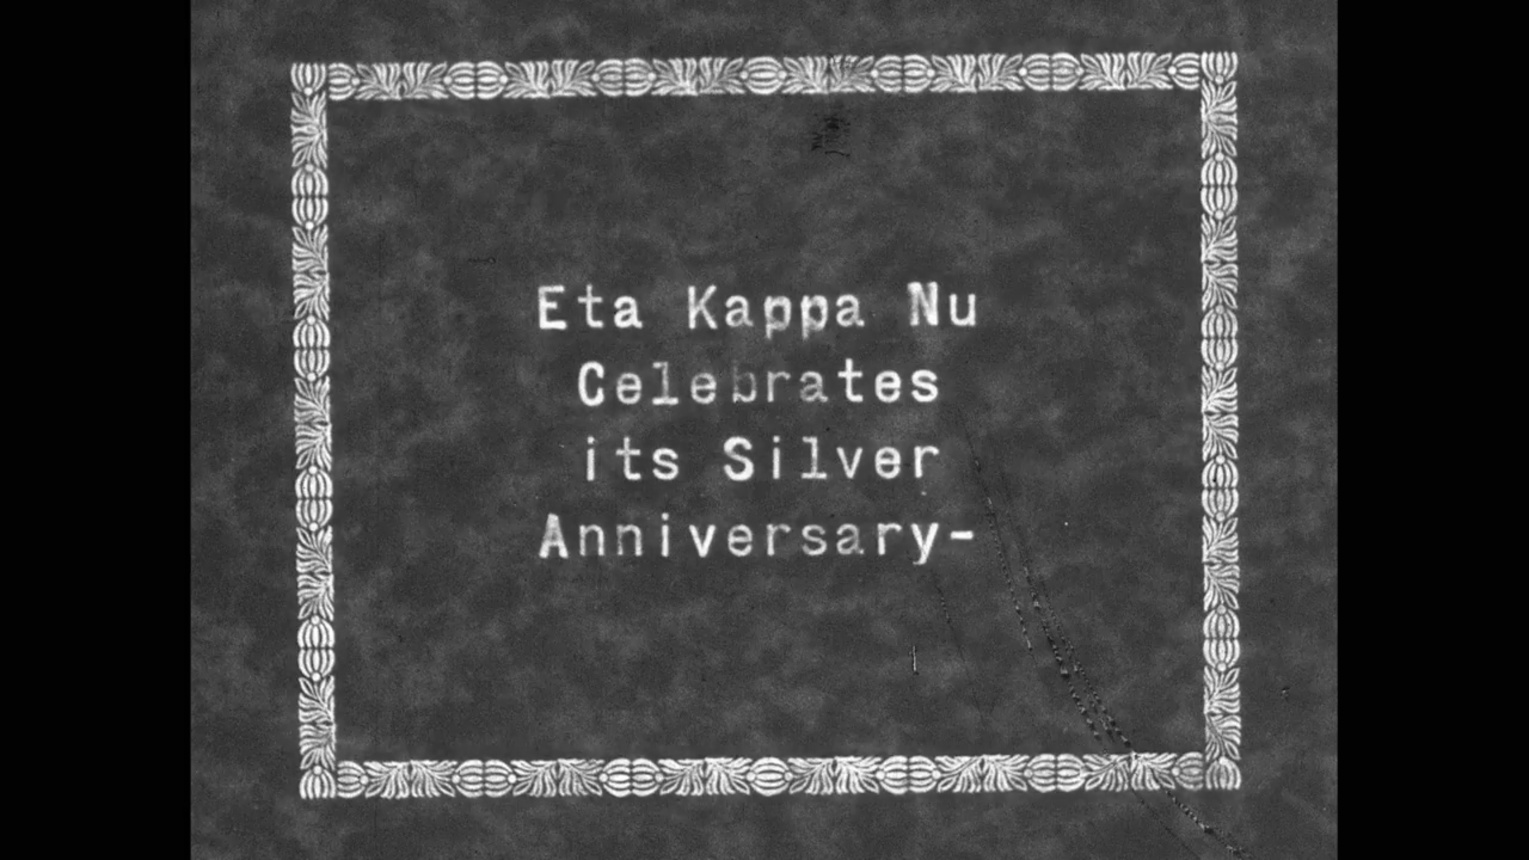 Eta Kappa Nu Silver Anniversary - University of Illinois 1929